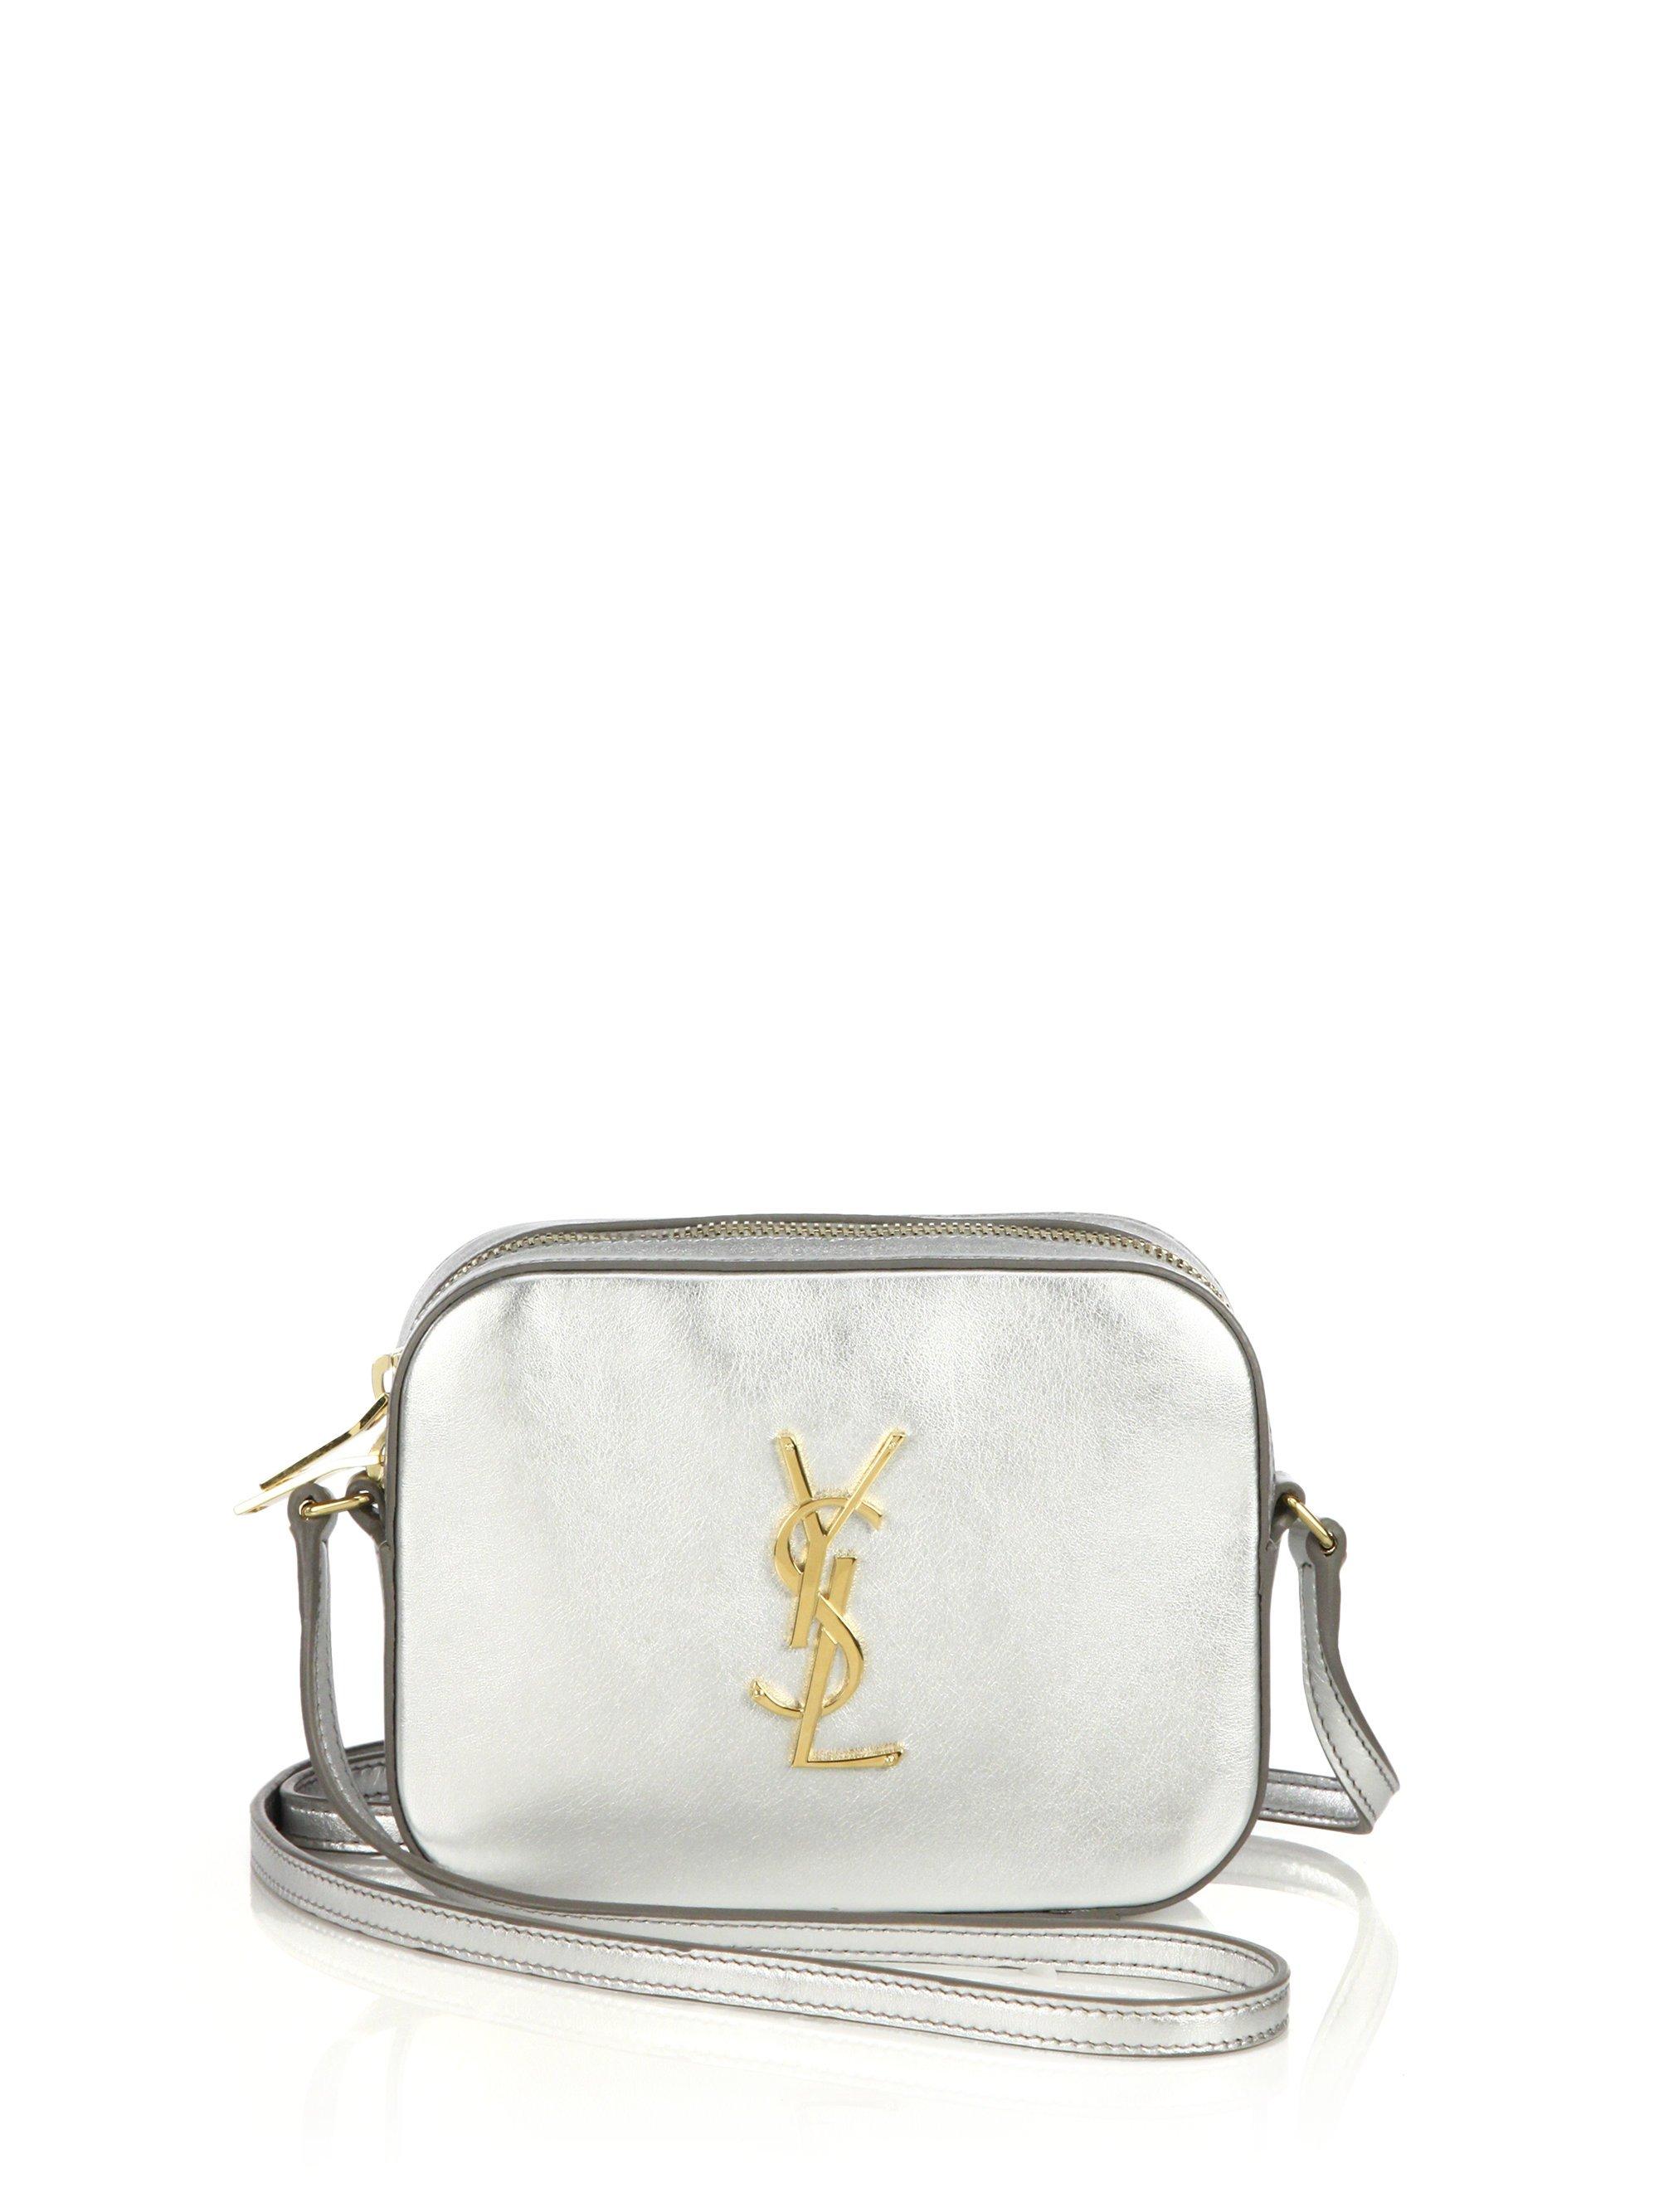 ysl clutch beige patent - yves saint laurent monogram west hollywood shoulder bag, www yves ...